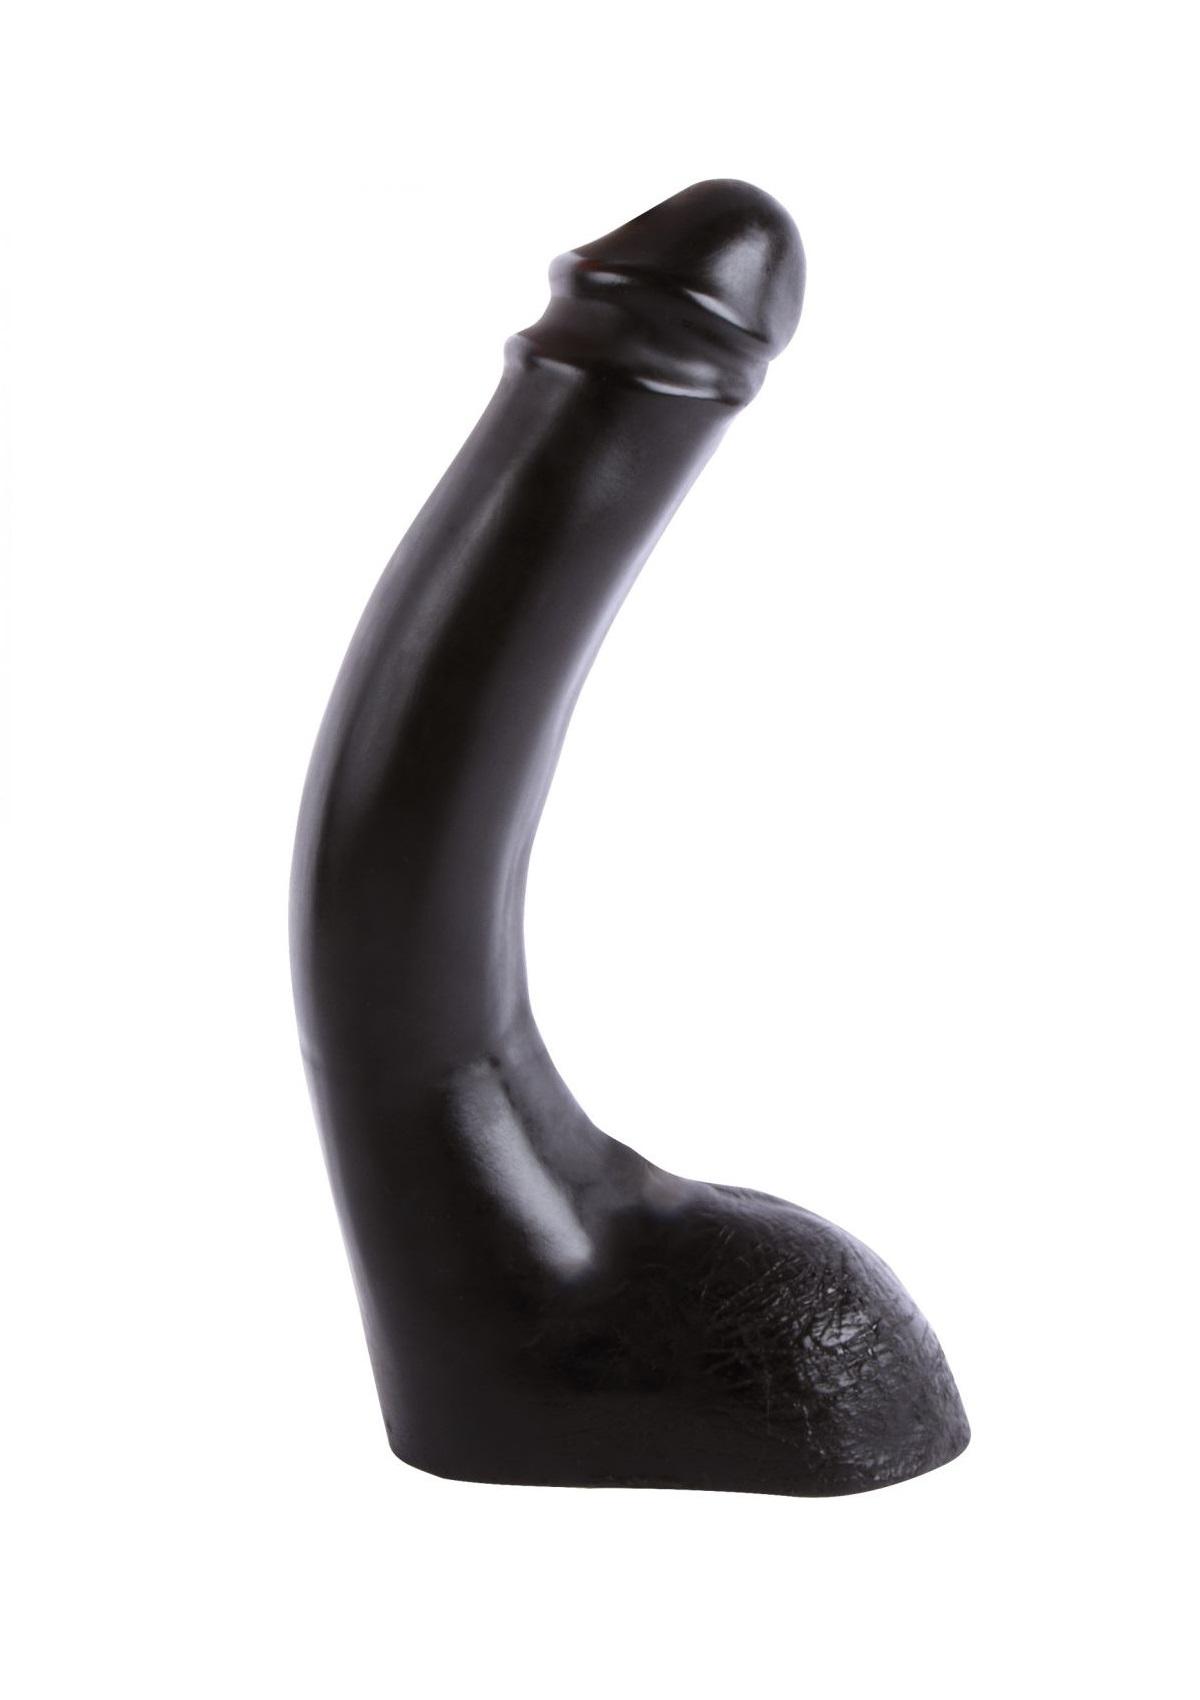 All Black-30cm.